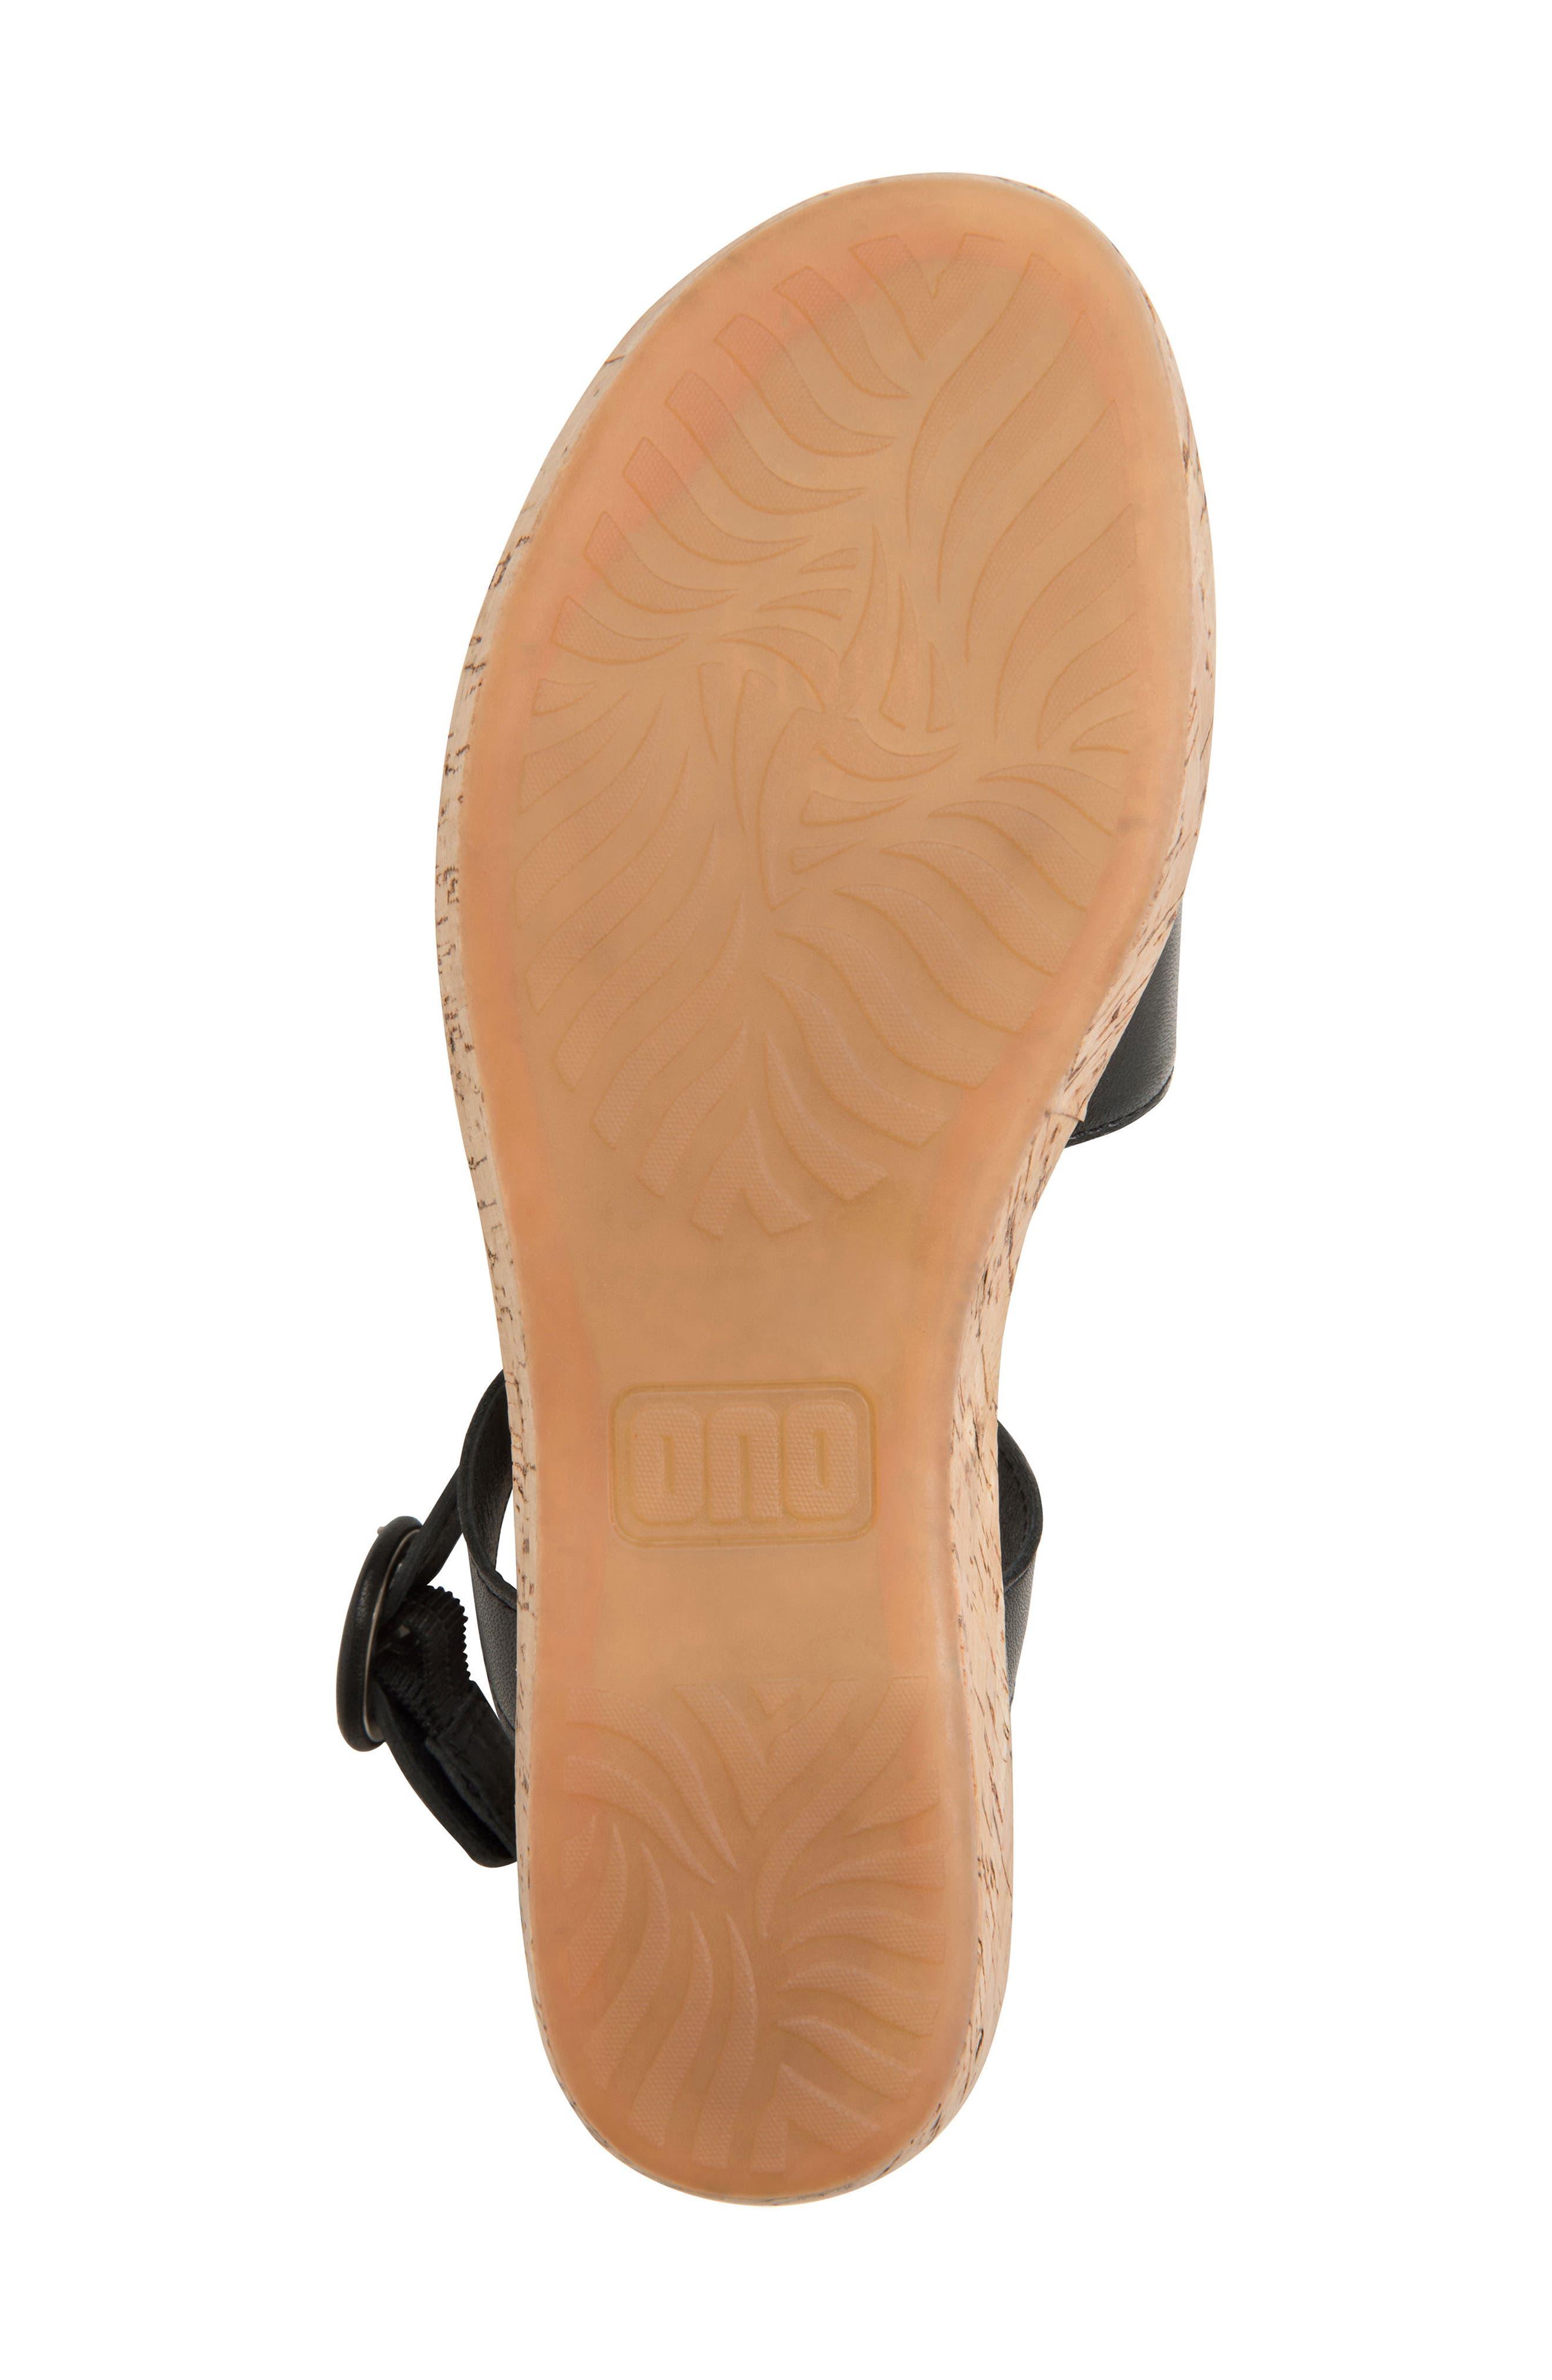 Dreamy Platform Wedge Sandal,                             Alternate thumbnail 6, color,                             Black Leather